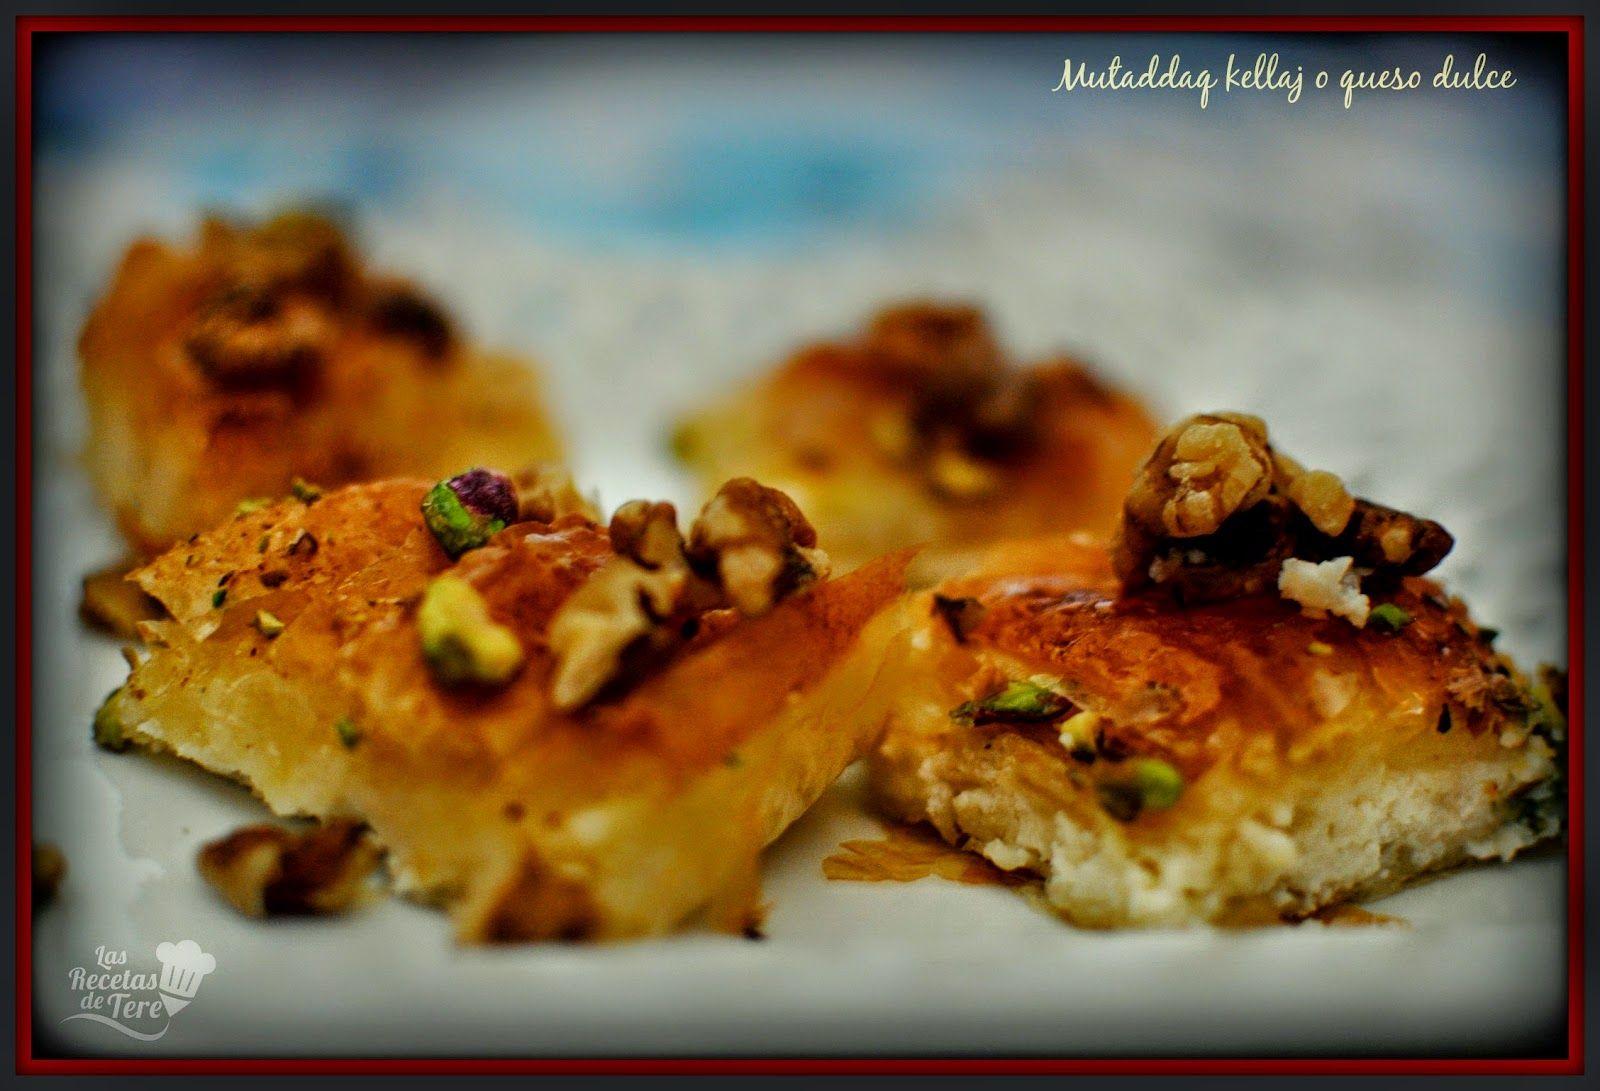 mutaddaq kellaj o queso dulce tererecetas las recetas de tere 06